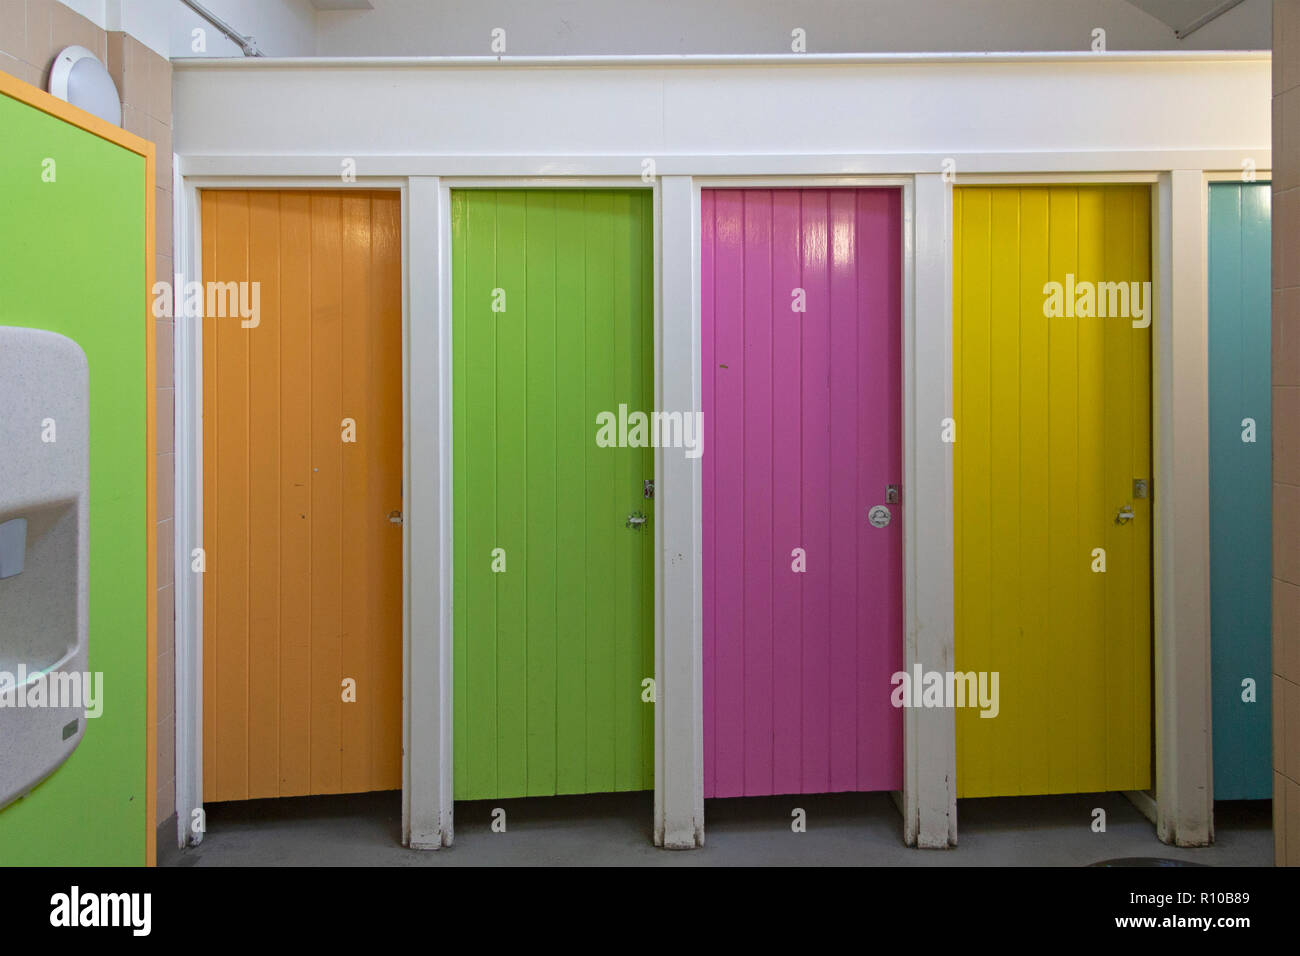 Damentoiletten, St. Ives, Cornwall, Inghilterra, Großbritannien | ladies' Bagni, St. Ives, Cornwall, Inghilterra, Gran Bretagna Immagini Stock